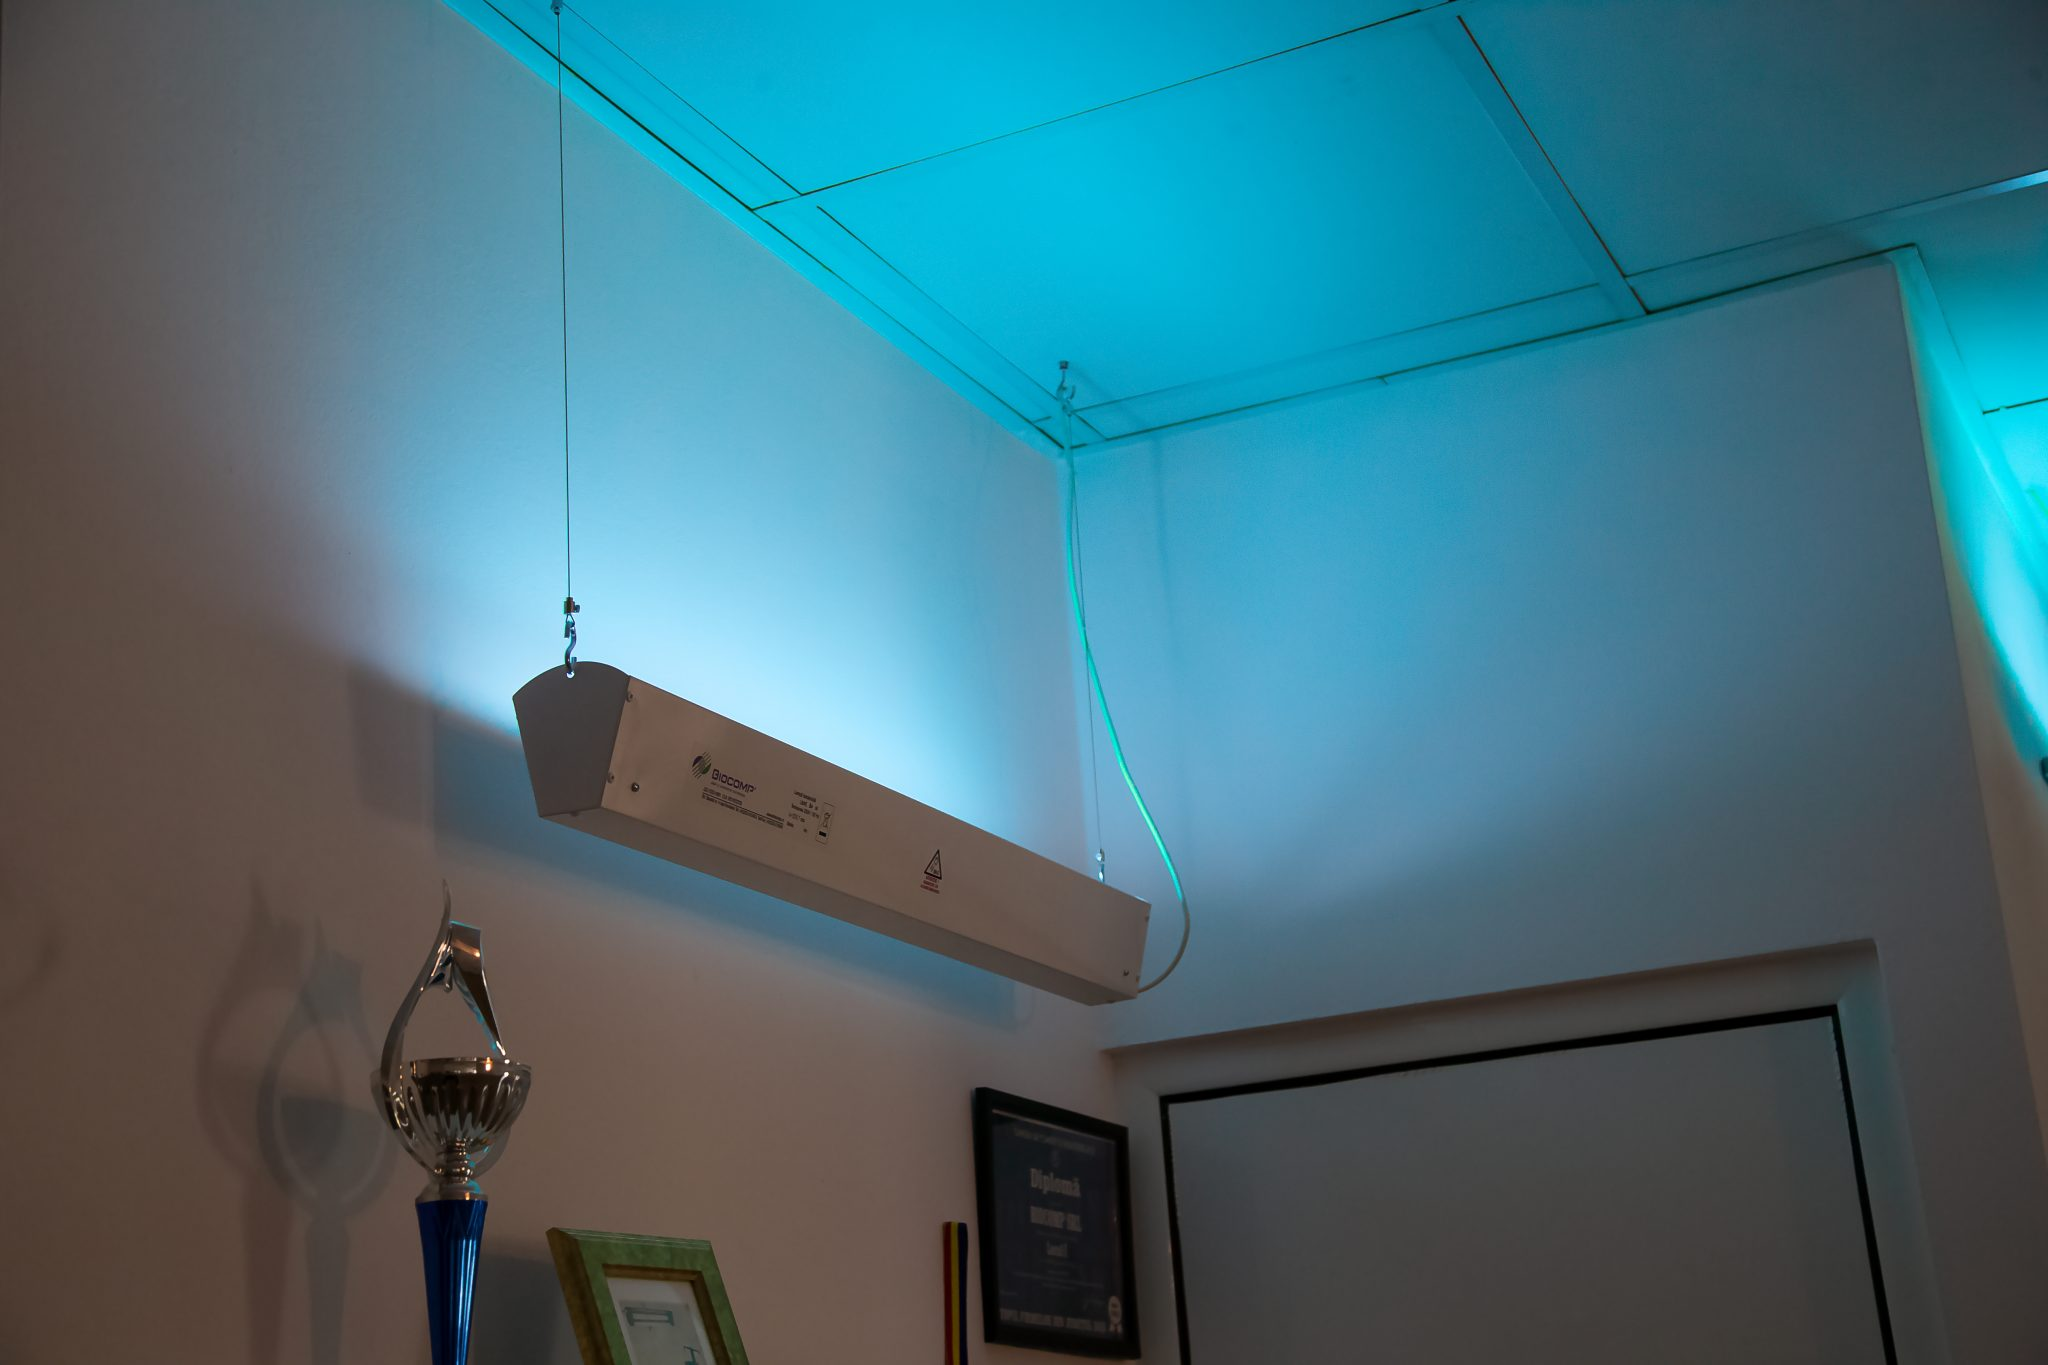 lampa 1 hol